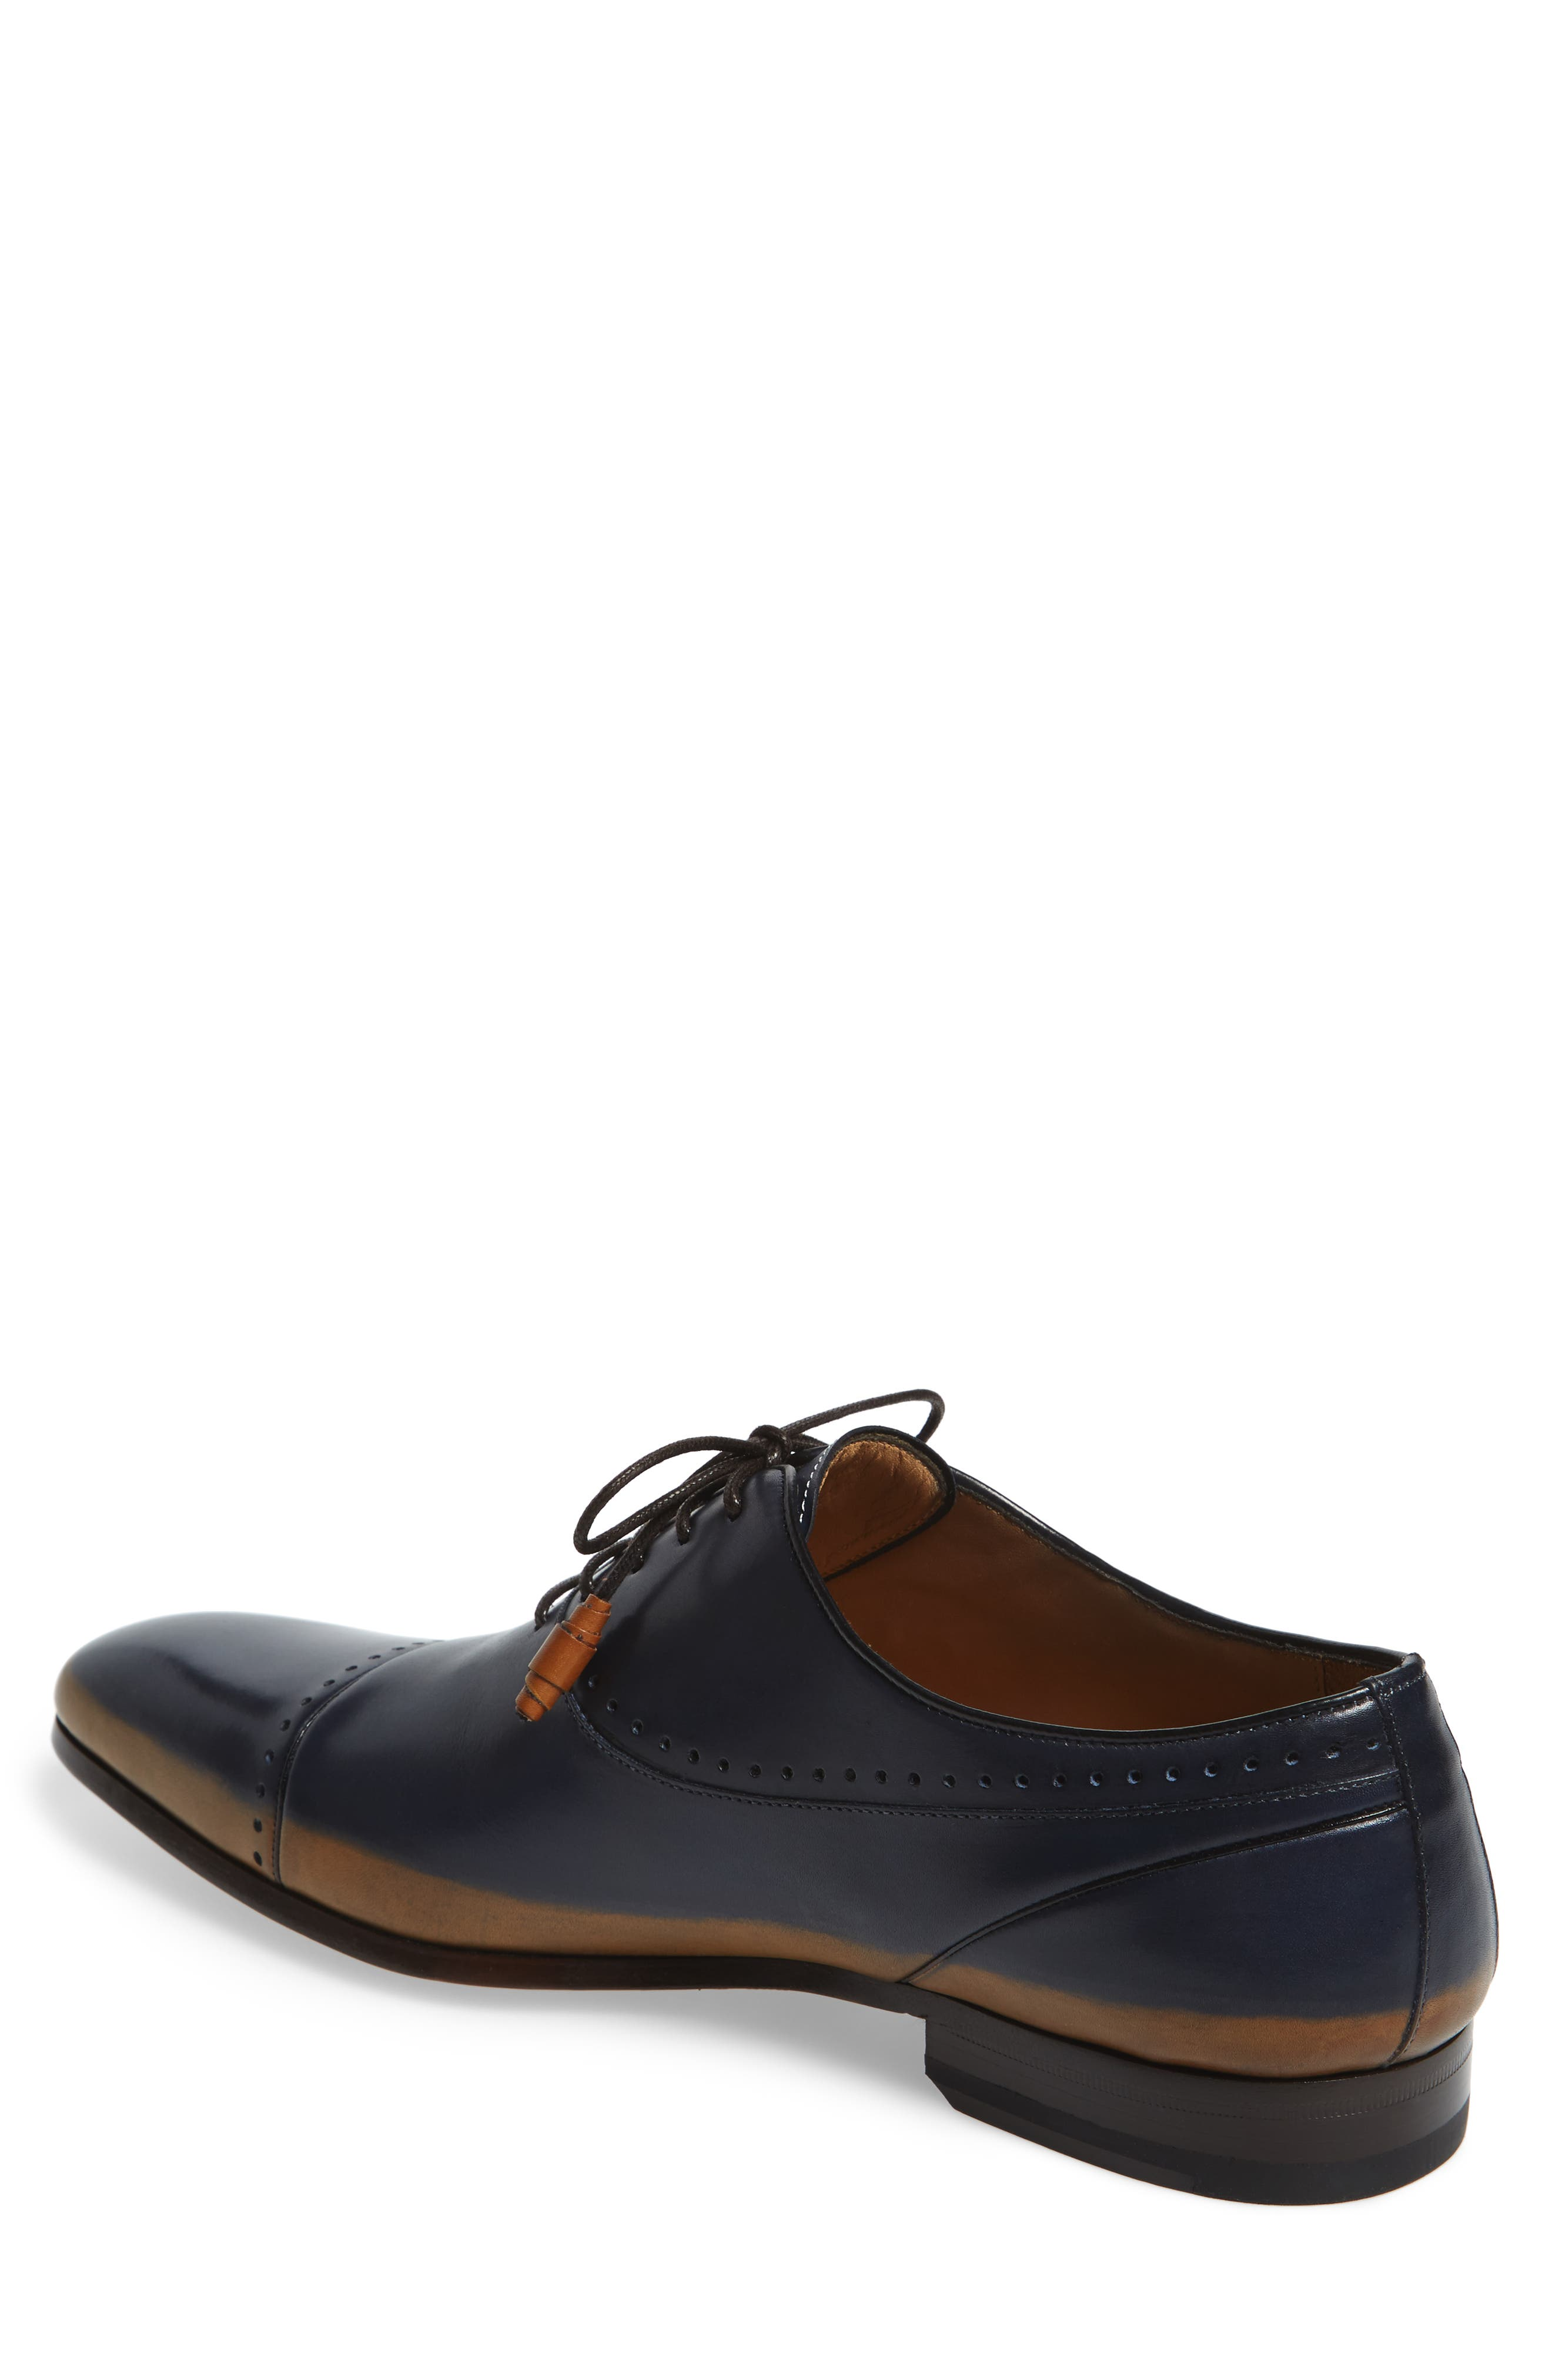 Icaro Cap Toe Oxford,                             Alternate thumbnail 2, color,                             Tan/ Blue Leather